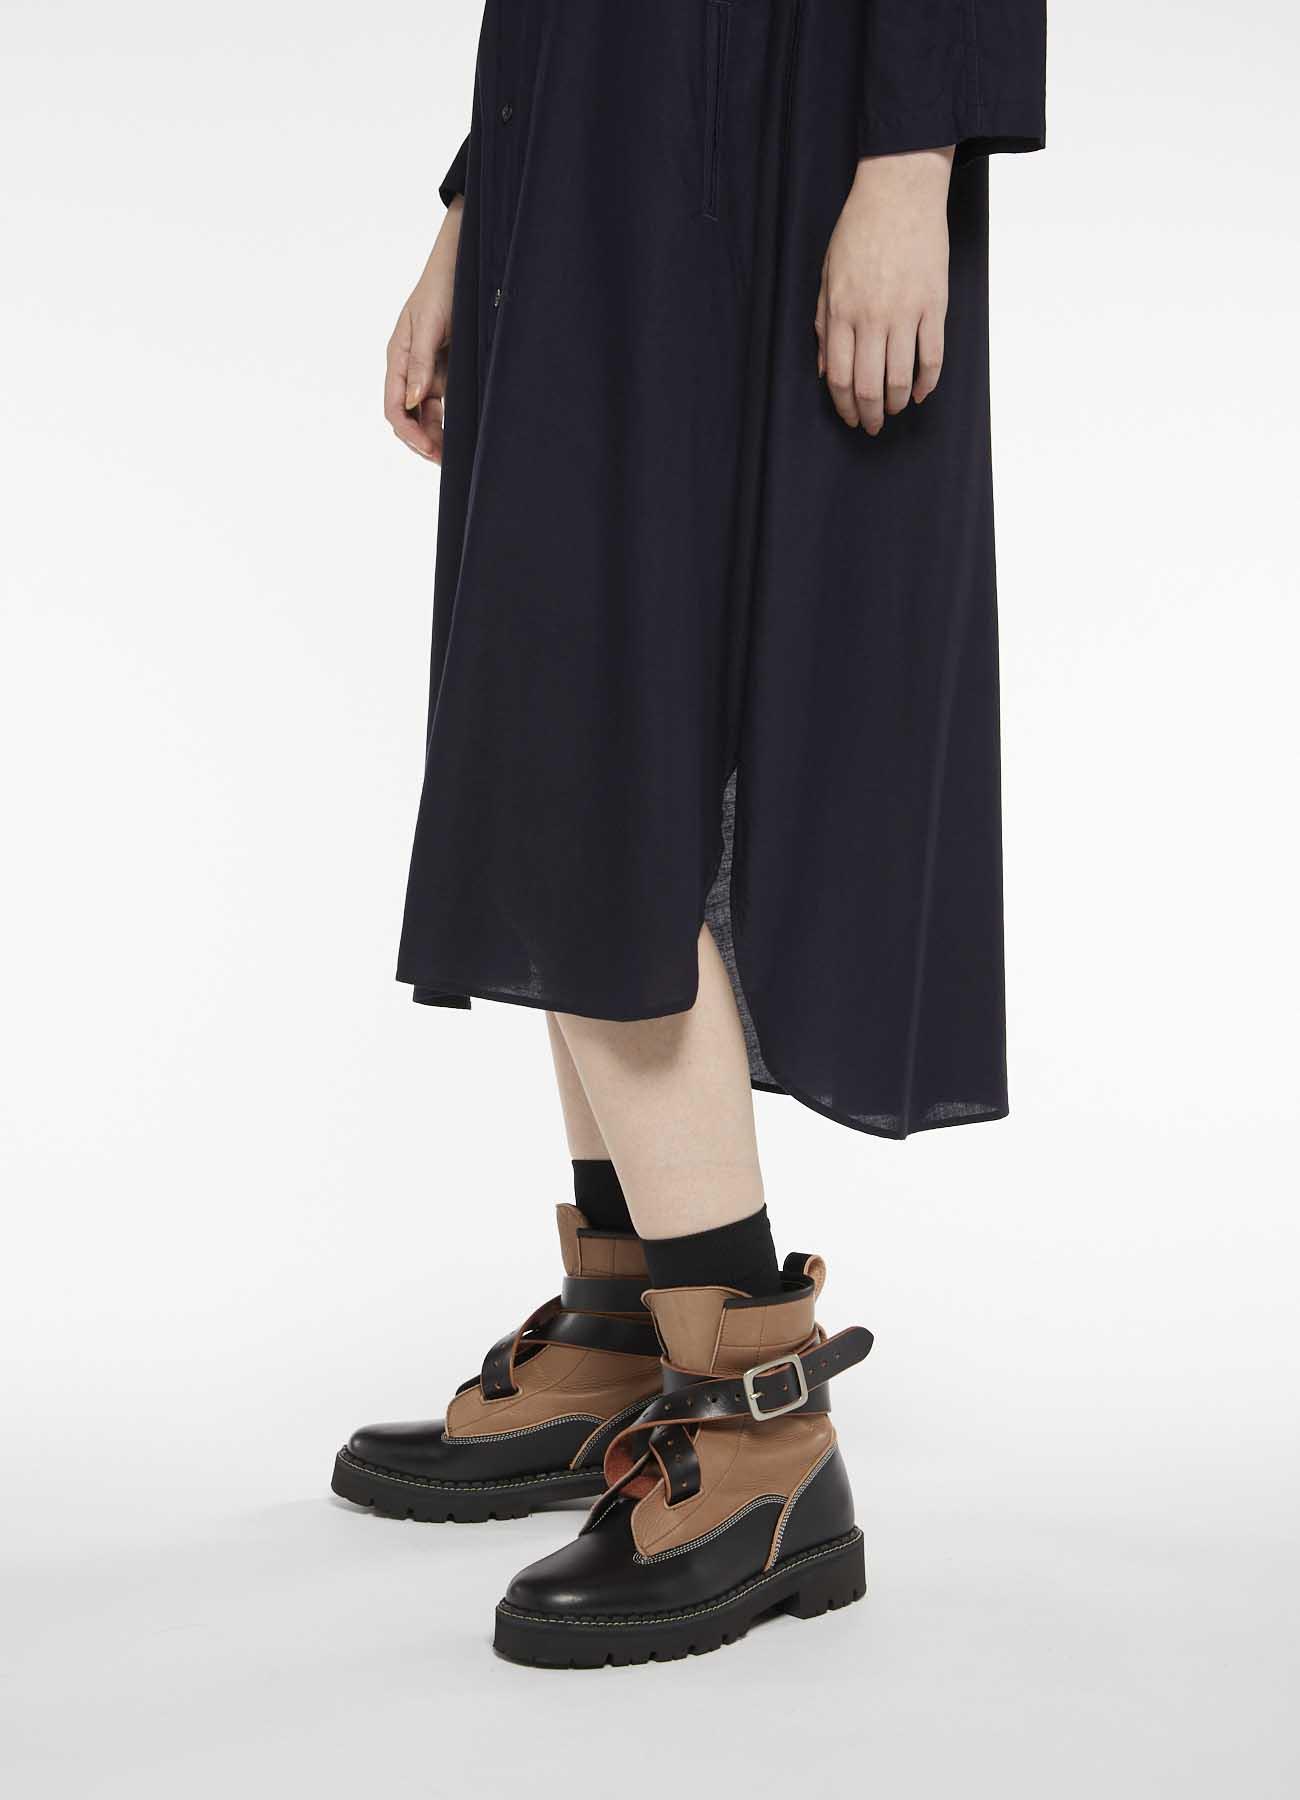 Y's-BORN PRODUCT LONG SHIRT DRESS